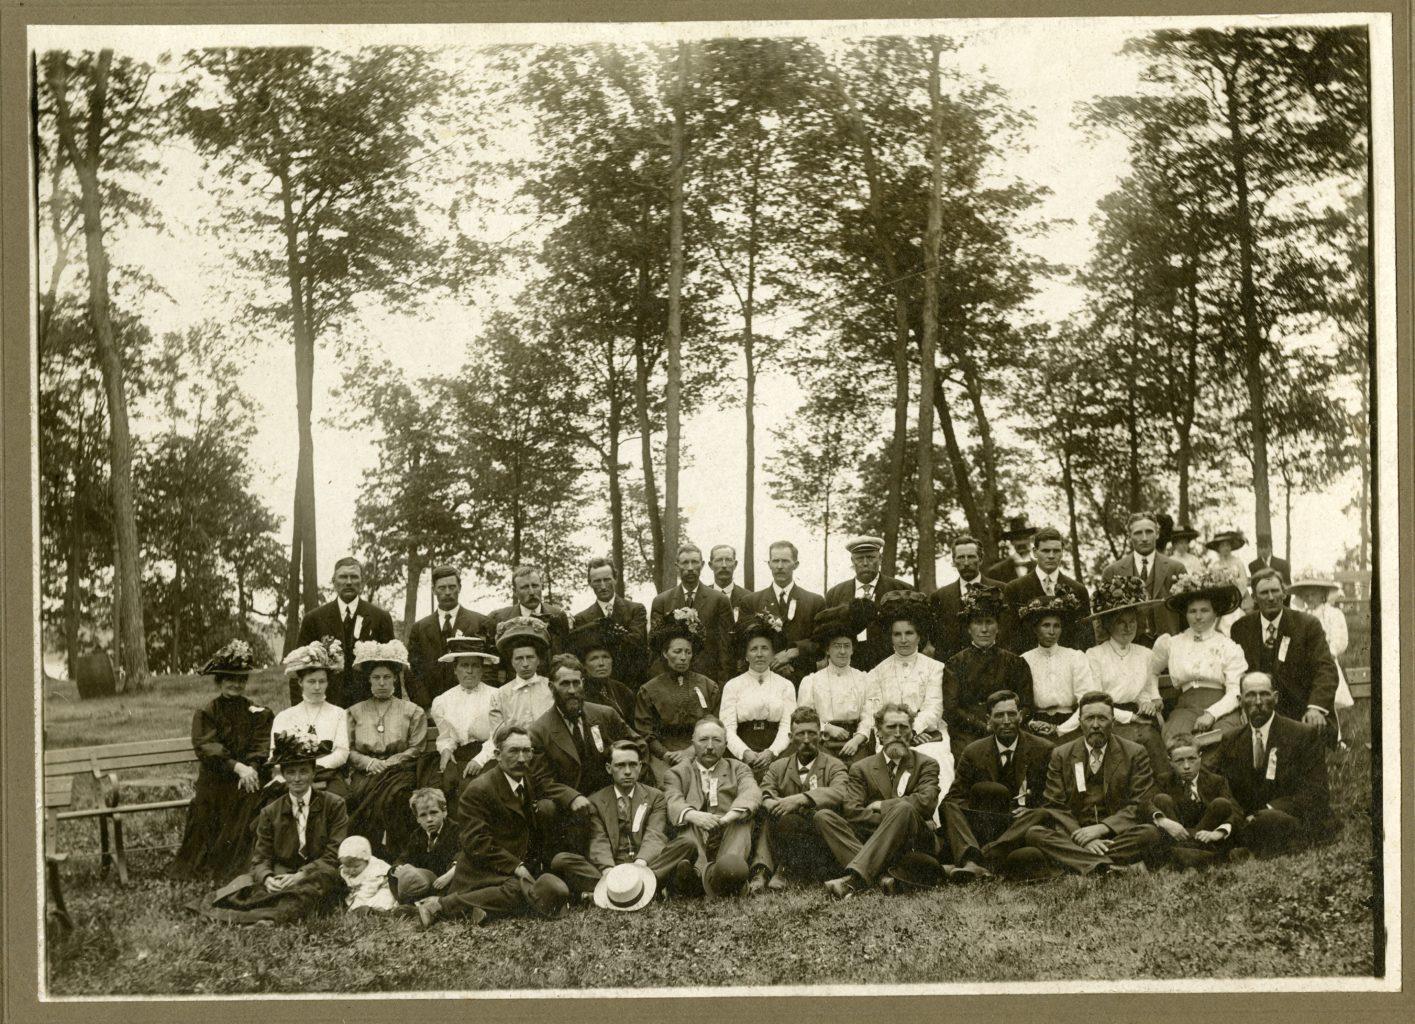 Group photo of men and women of Nordfjordlaget.